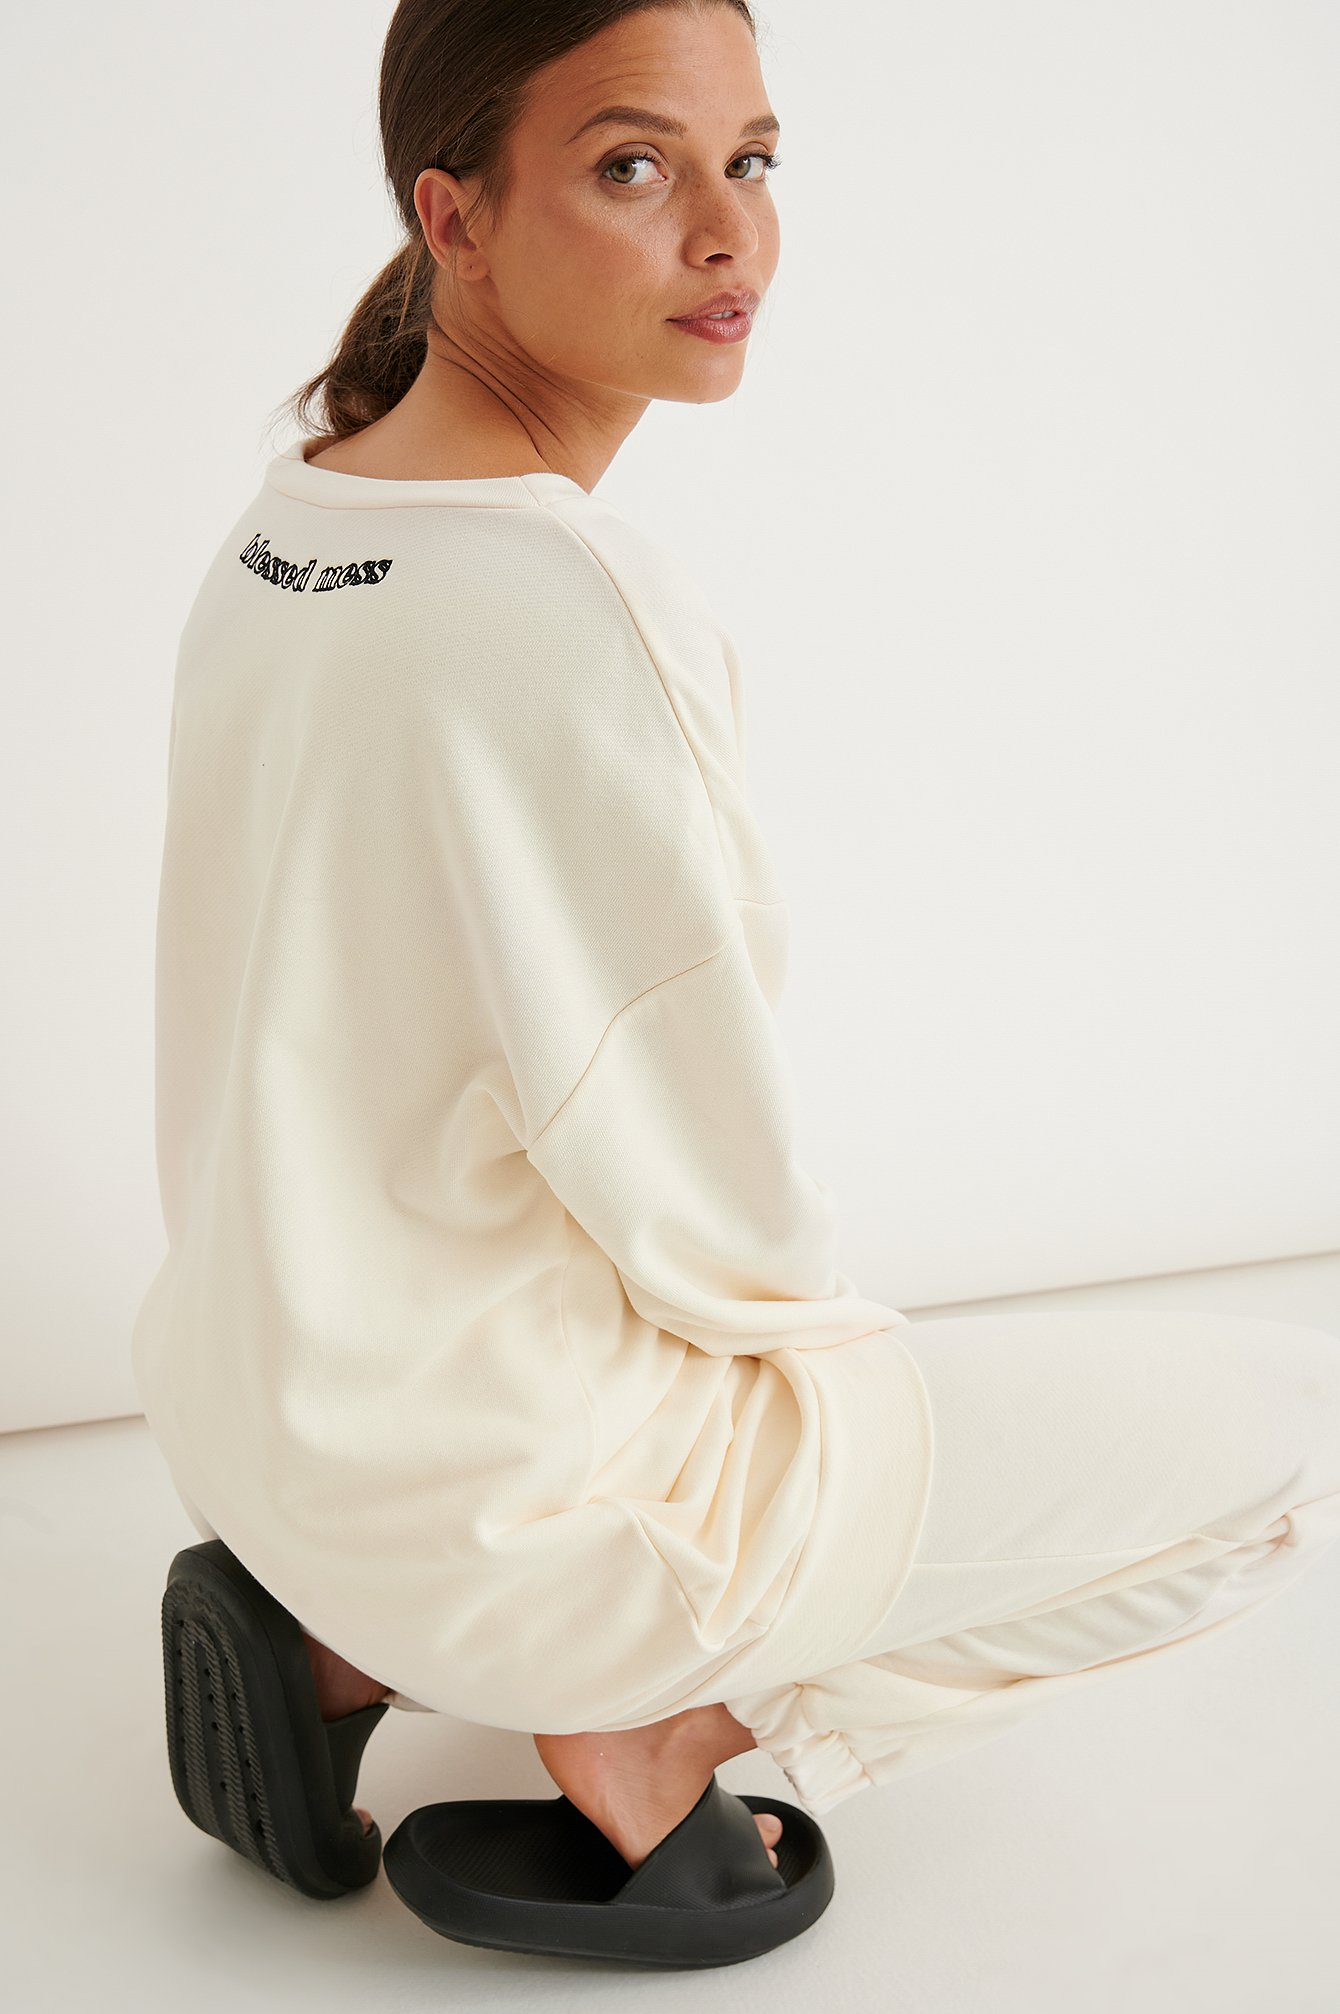 marije zuurveld x na-kd -  V-neck Sweater - Offwhite